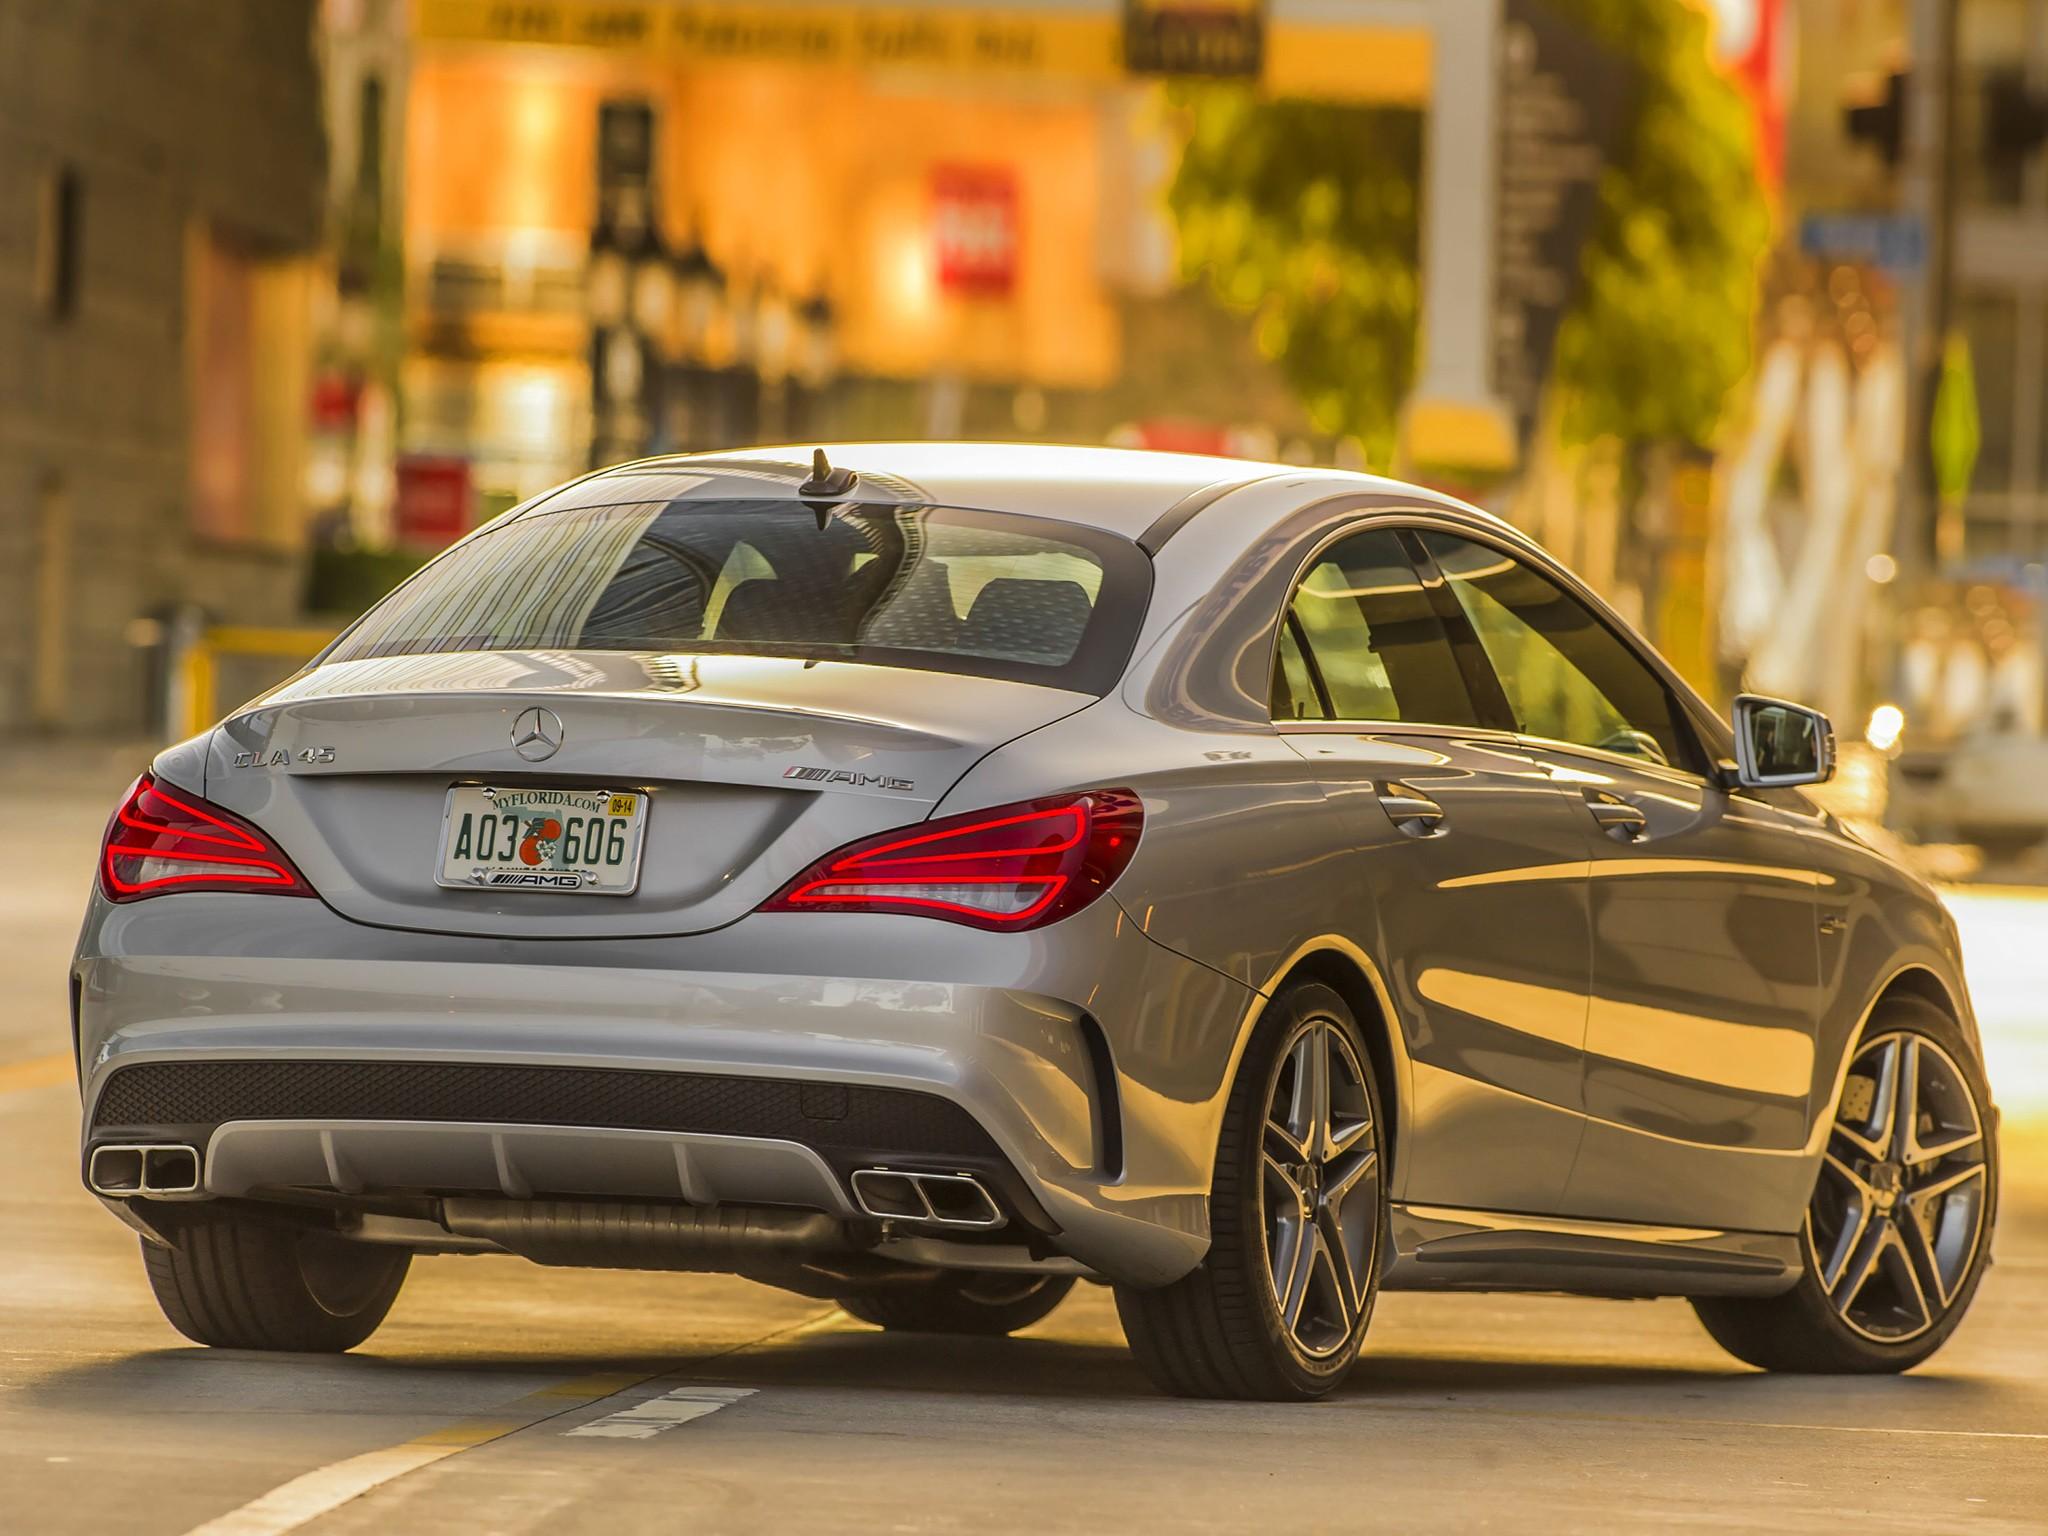 Mercedes benz cla 45 amg 2013 2014 2015 2016 for Mercedes benz us